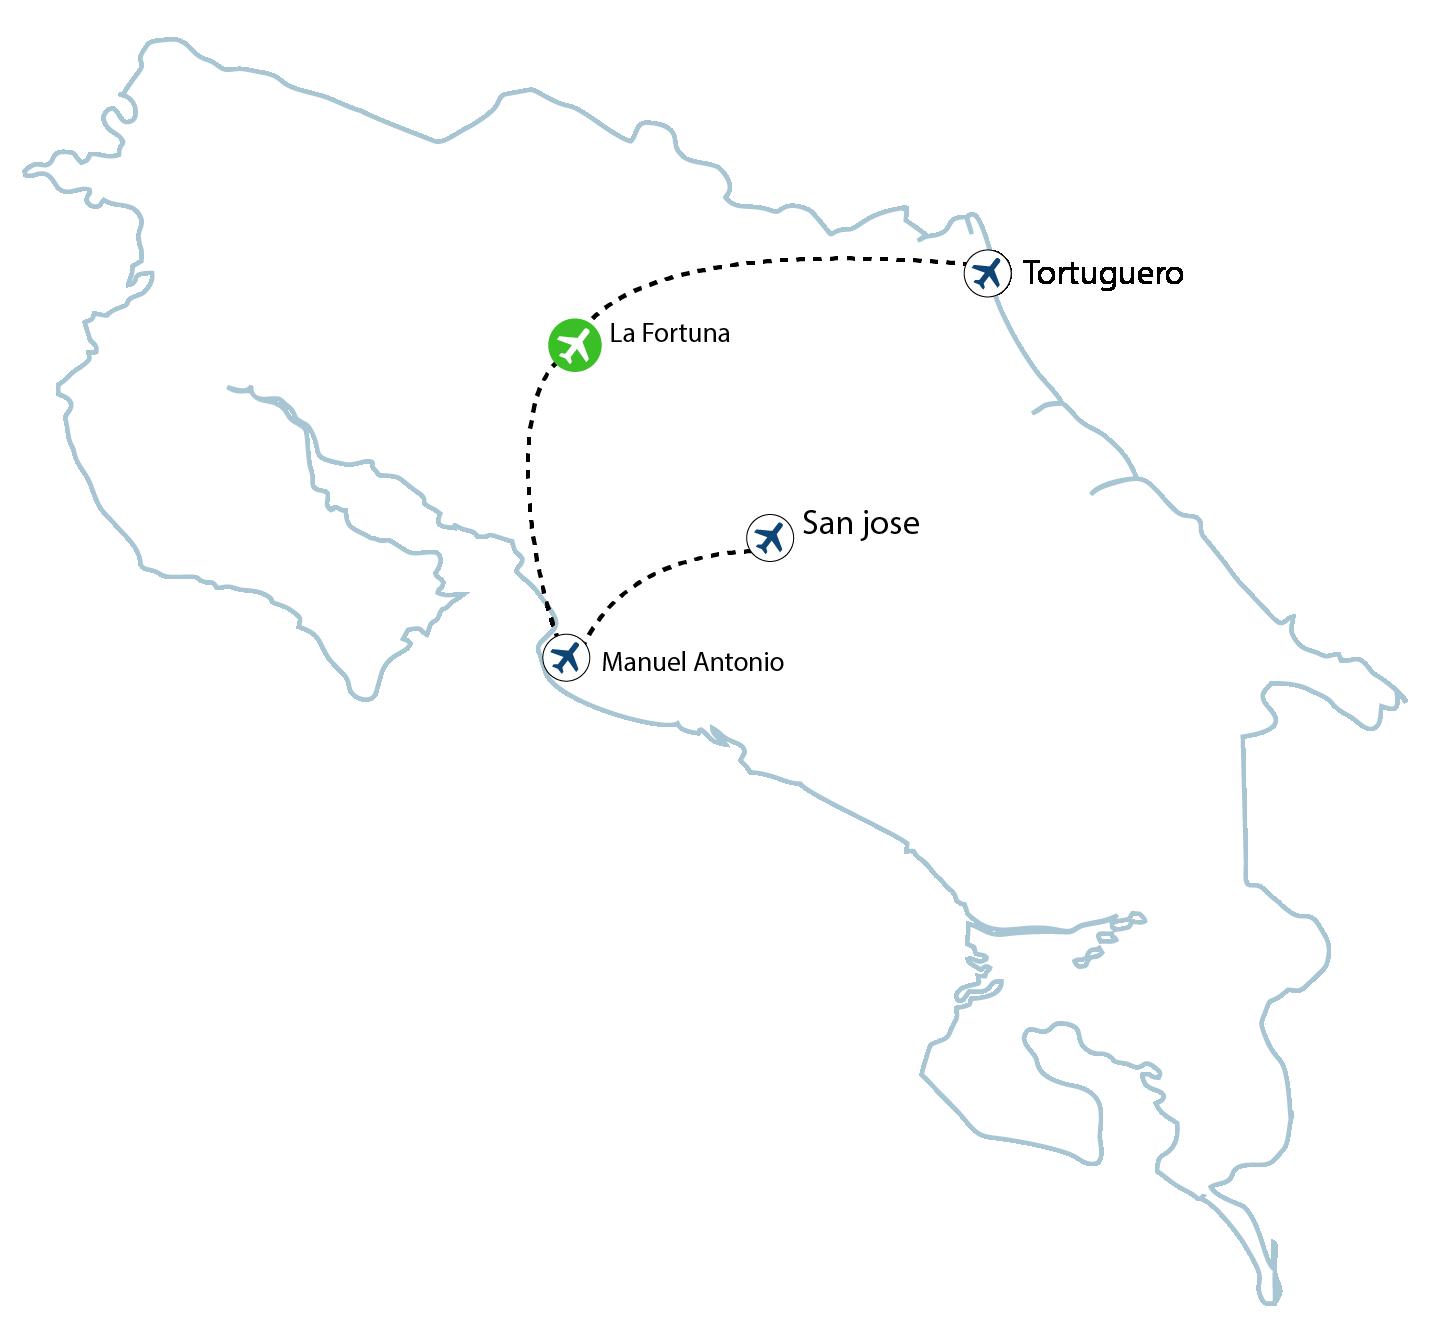 map la fortuna 01 - La Fortuna Flights